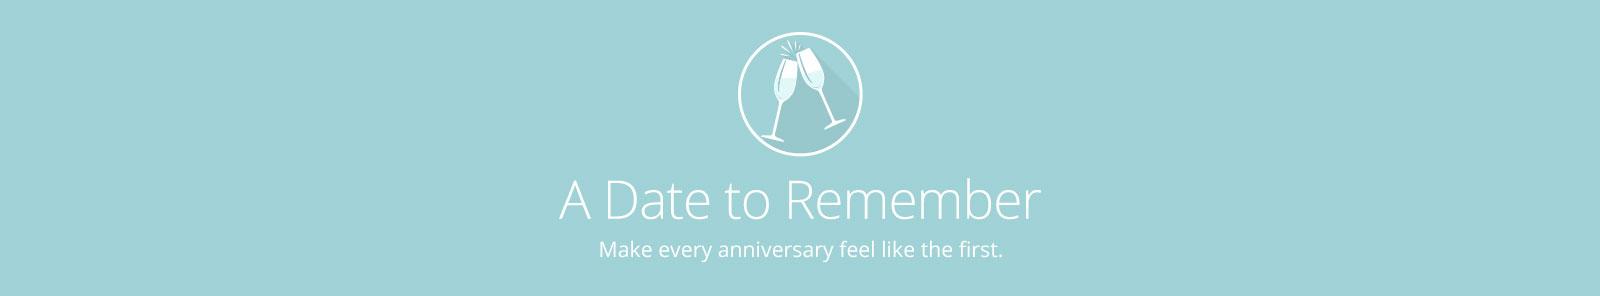 Anniversary Gifts Desktop Banner